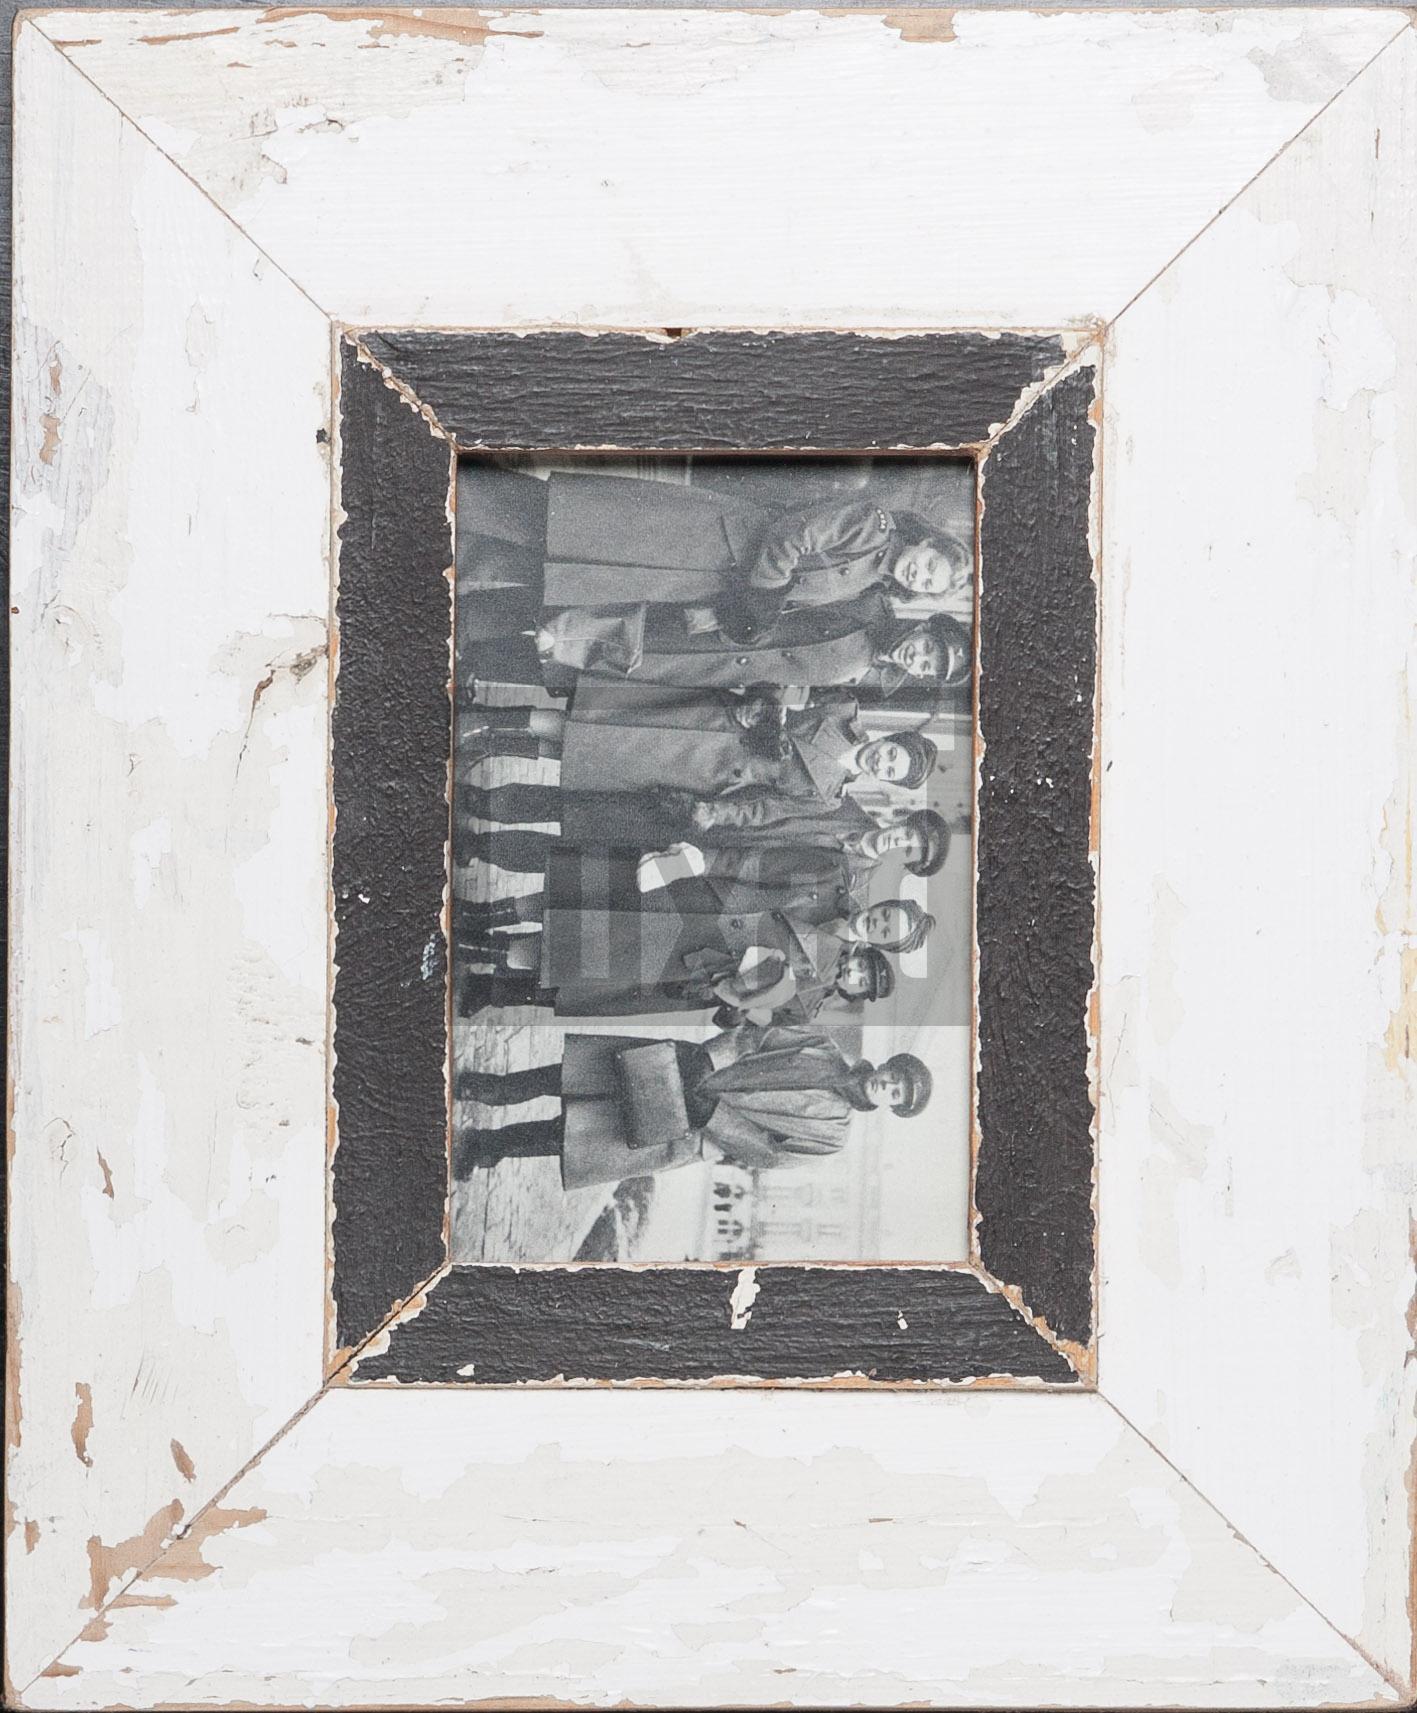 Vintage-Fotorahmen aus recyceltem Holz von der Luna Design Company